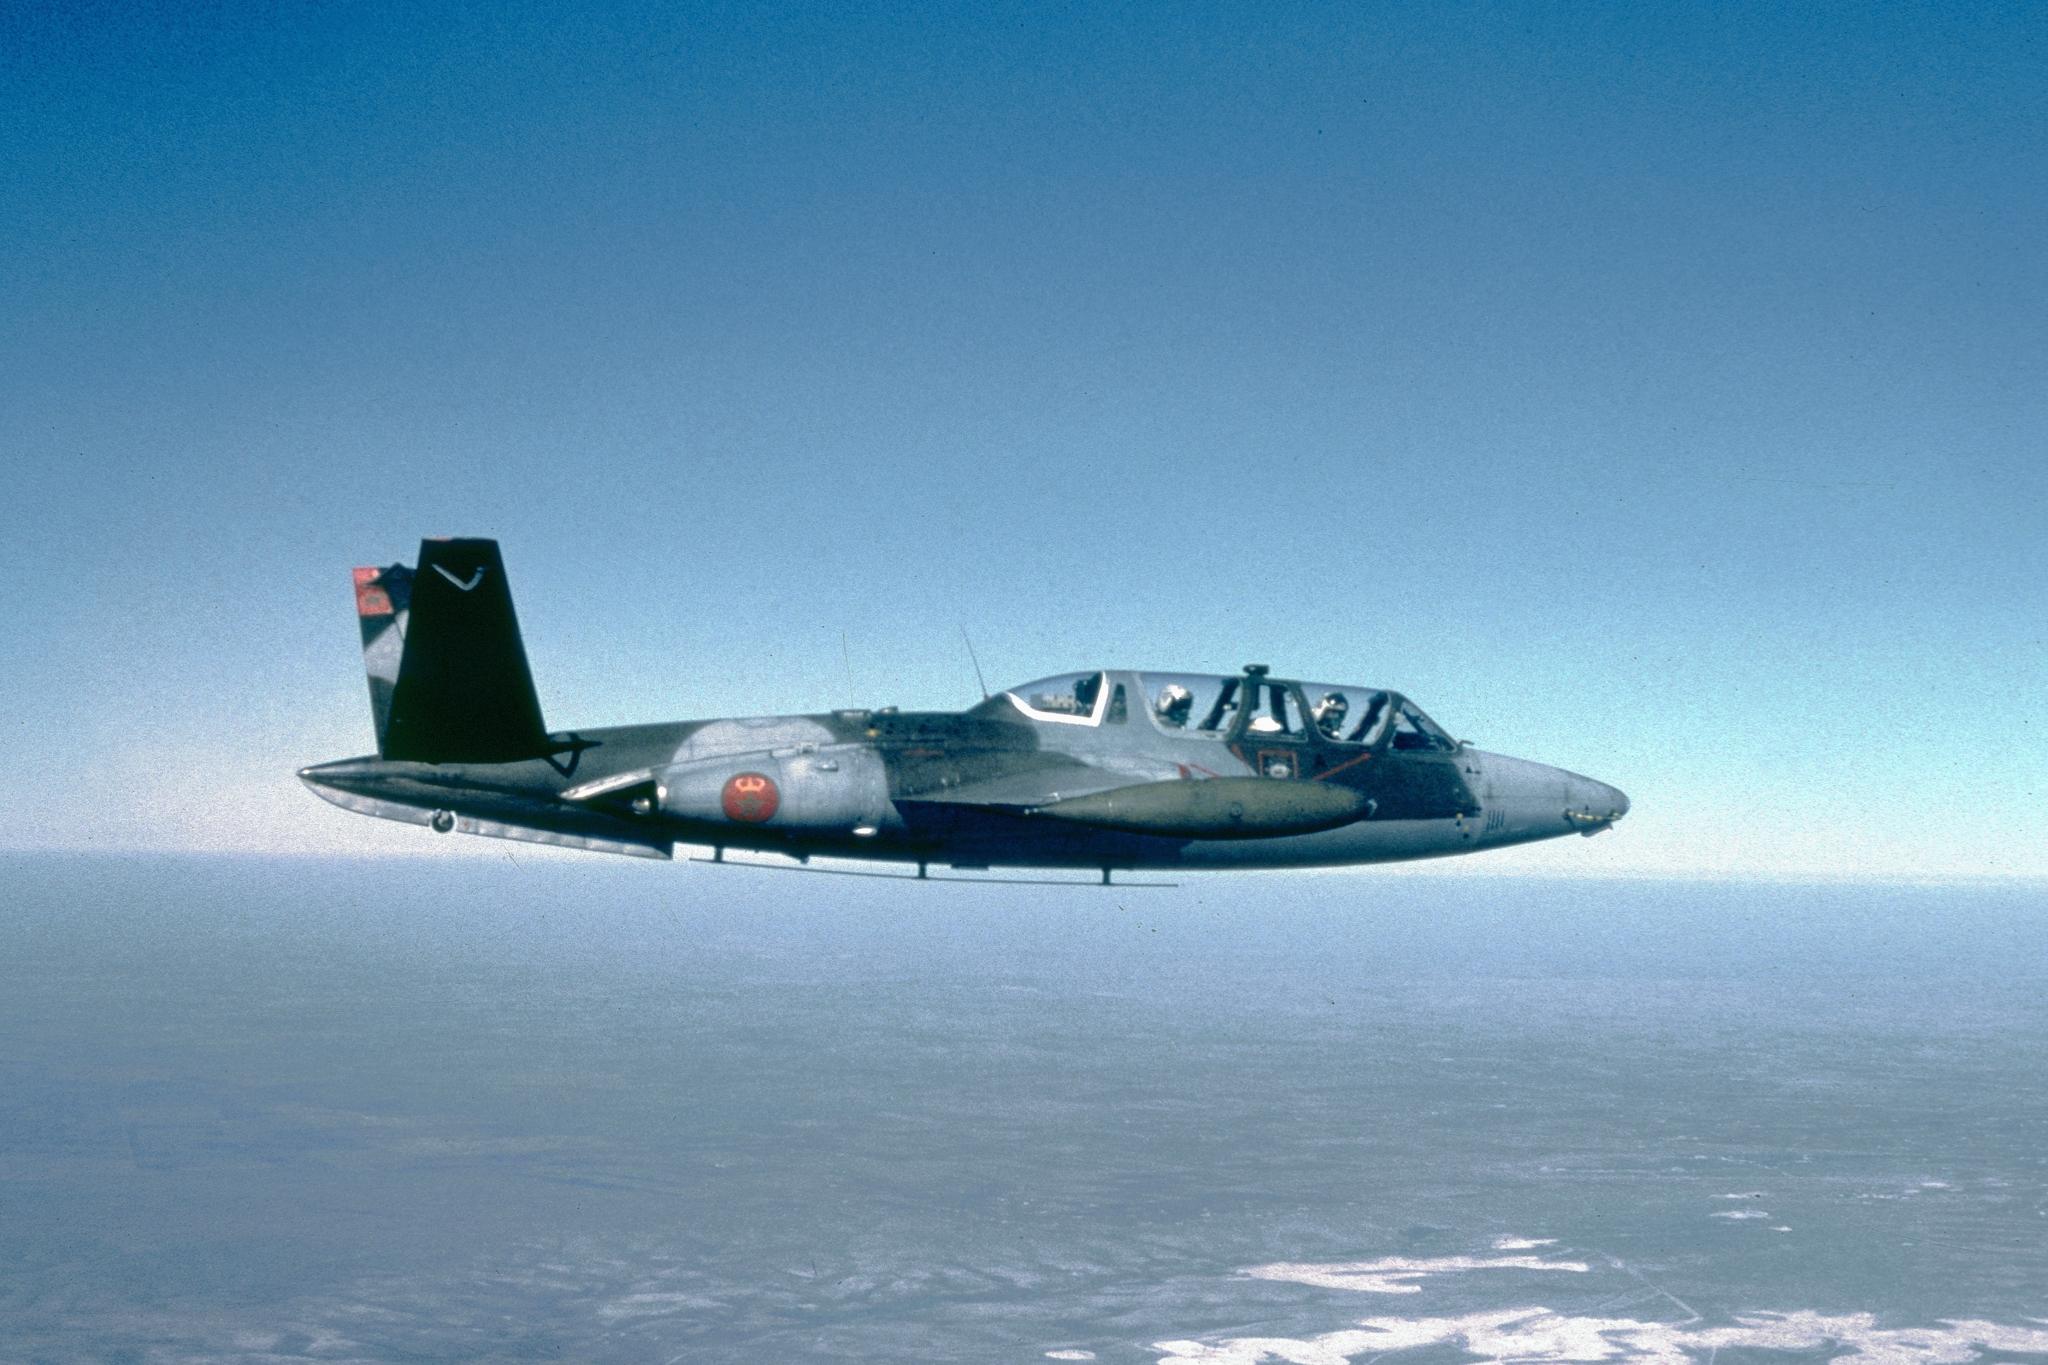 FRA: Photos anciens avions des FRA - Page 13 45904355075_5981ab4f84_o